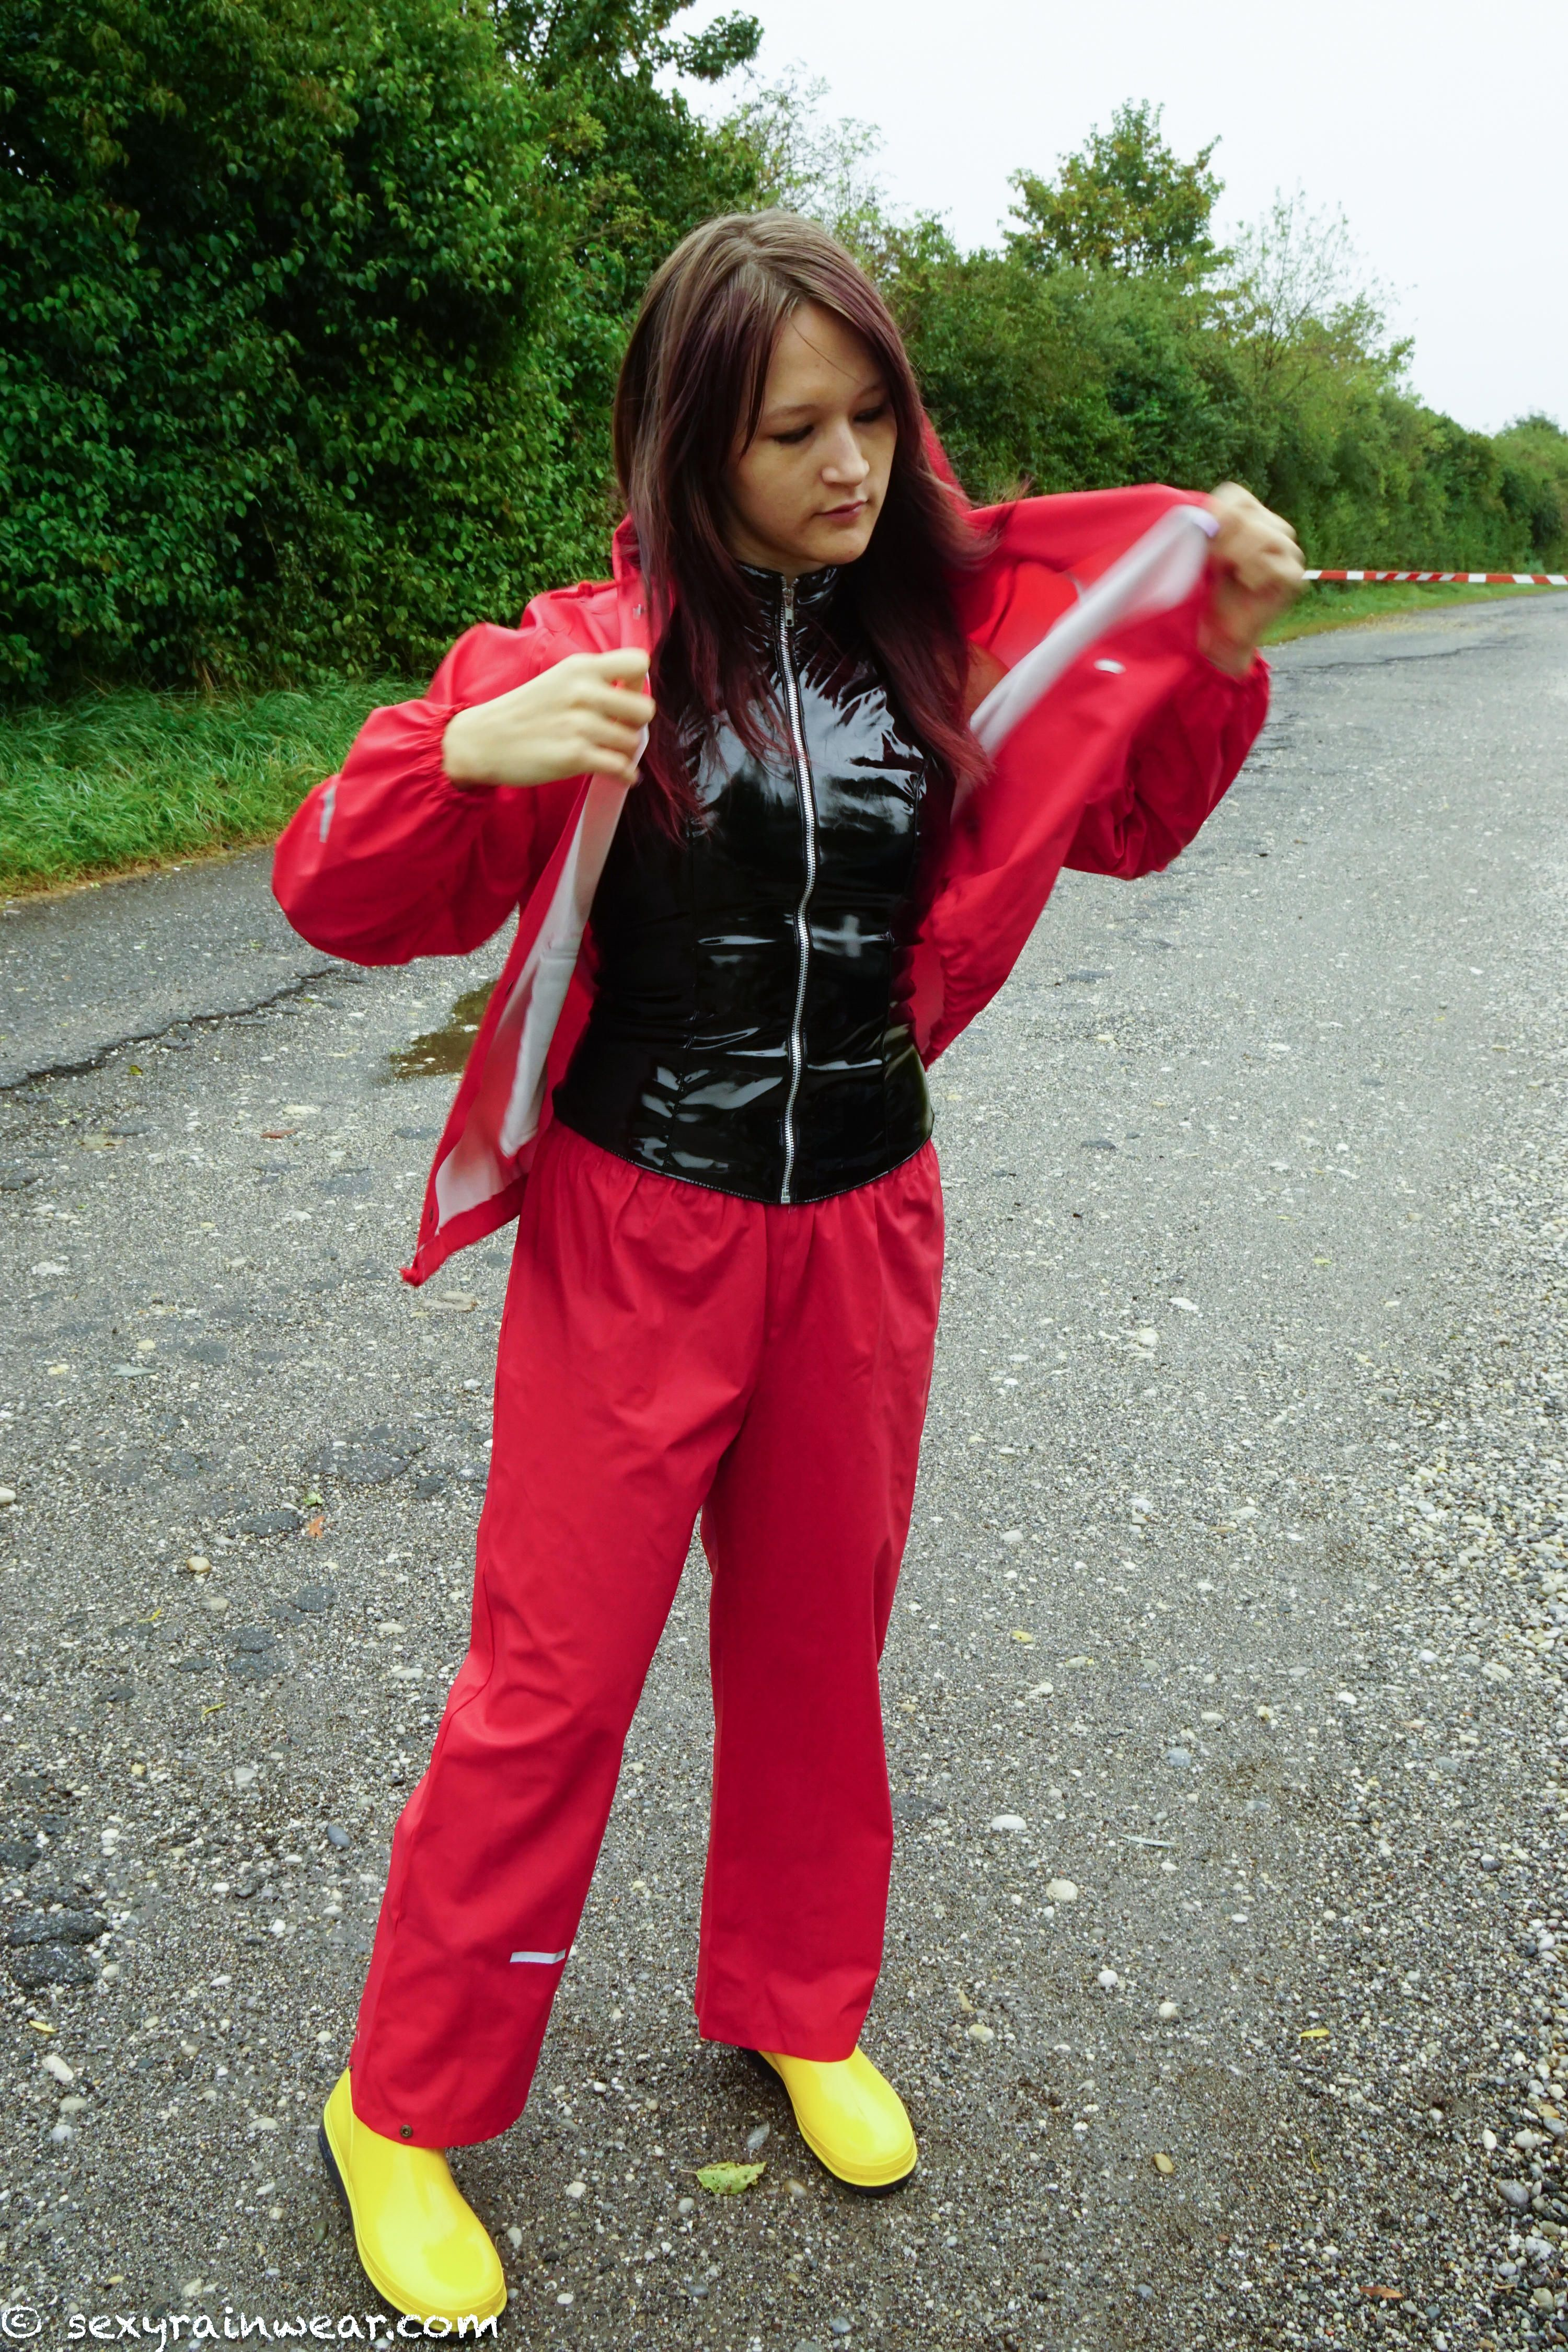 Pin by Arny on Rainwear  bd31d9f78